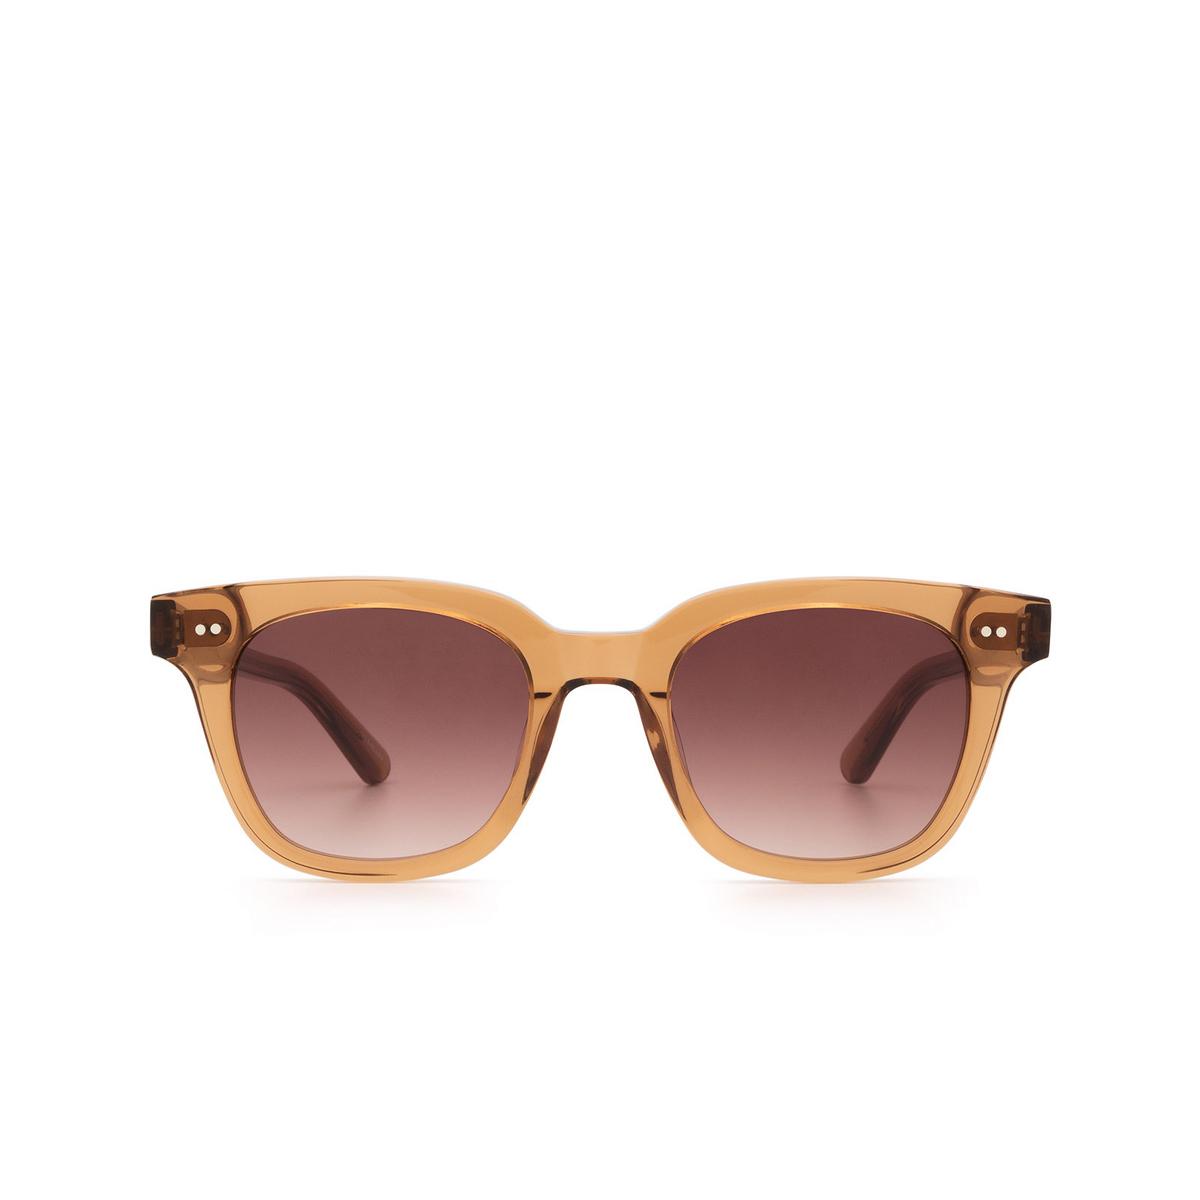 Chimi® Square Sunglasses: #101 color Brown Cinnamon Brown - front view.